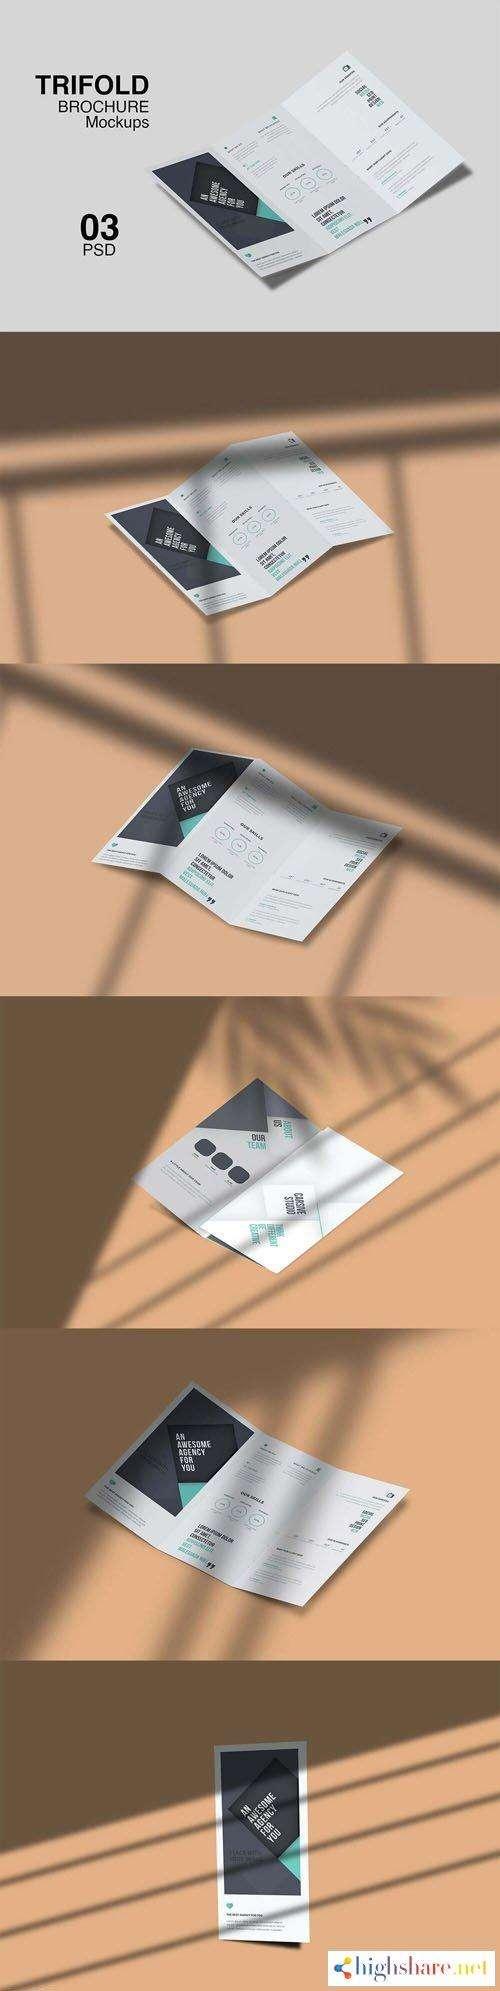 tri fold brochure psd mockups pack 5f41f08e62c1d - Tri-fold Brochure PSD Mockups Pack